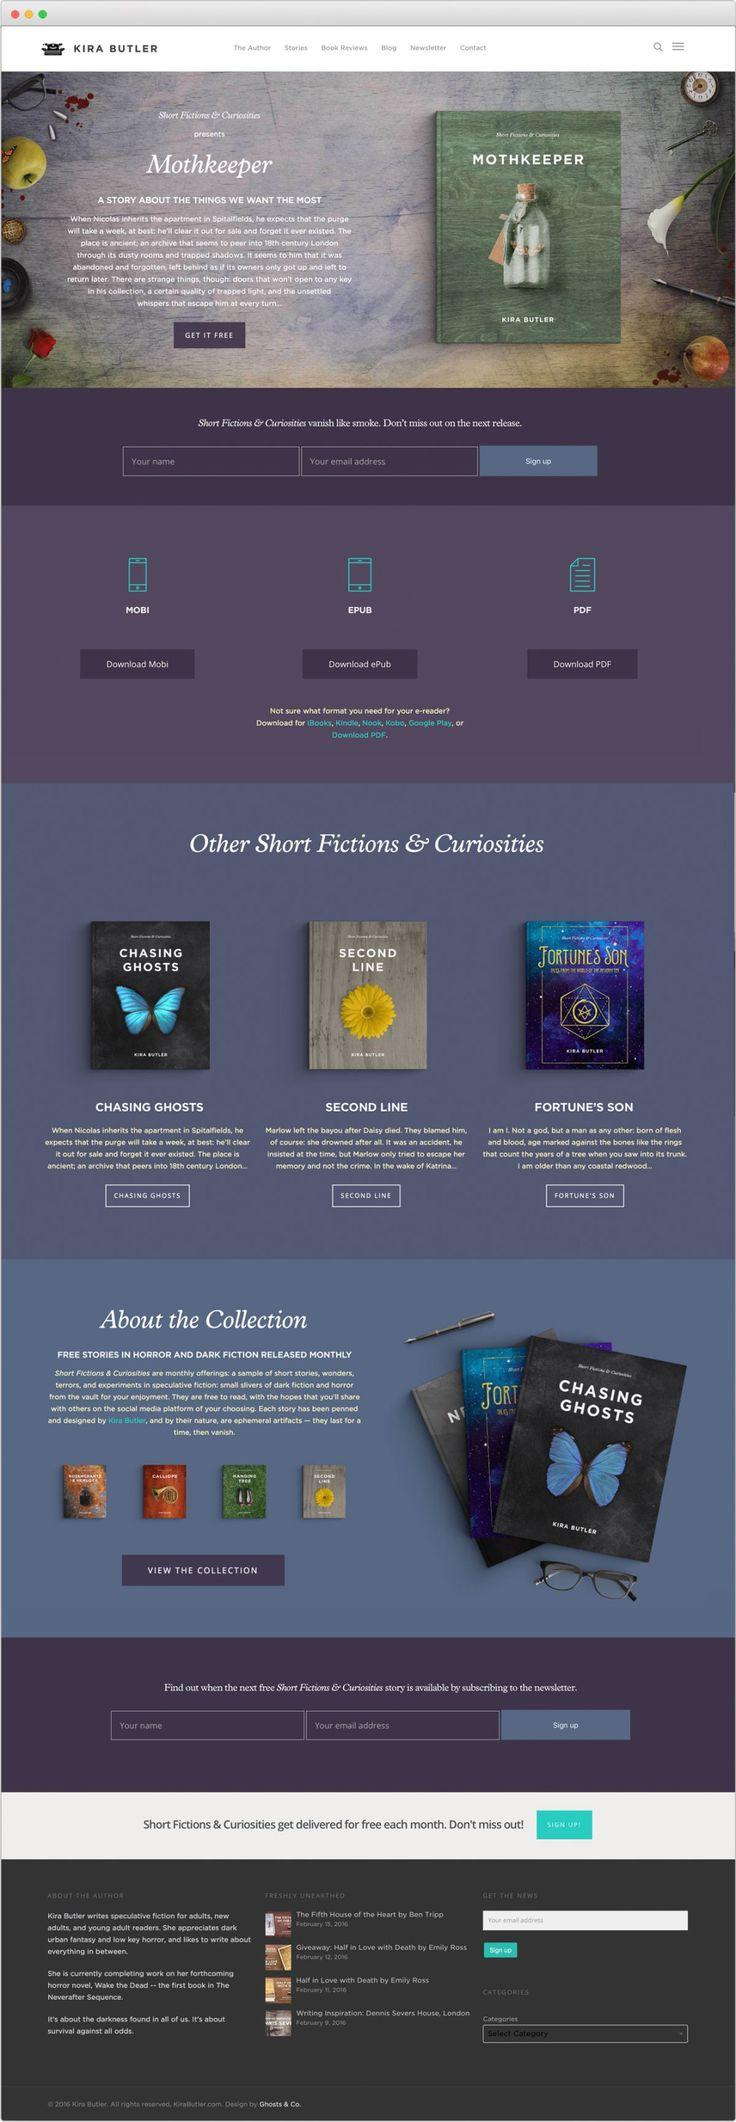 Kira Butler | Book Landing Pages and a design facelift